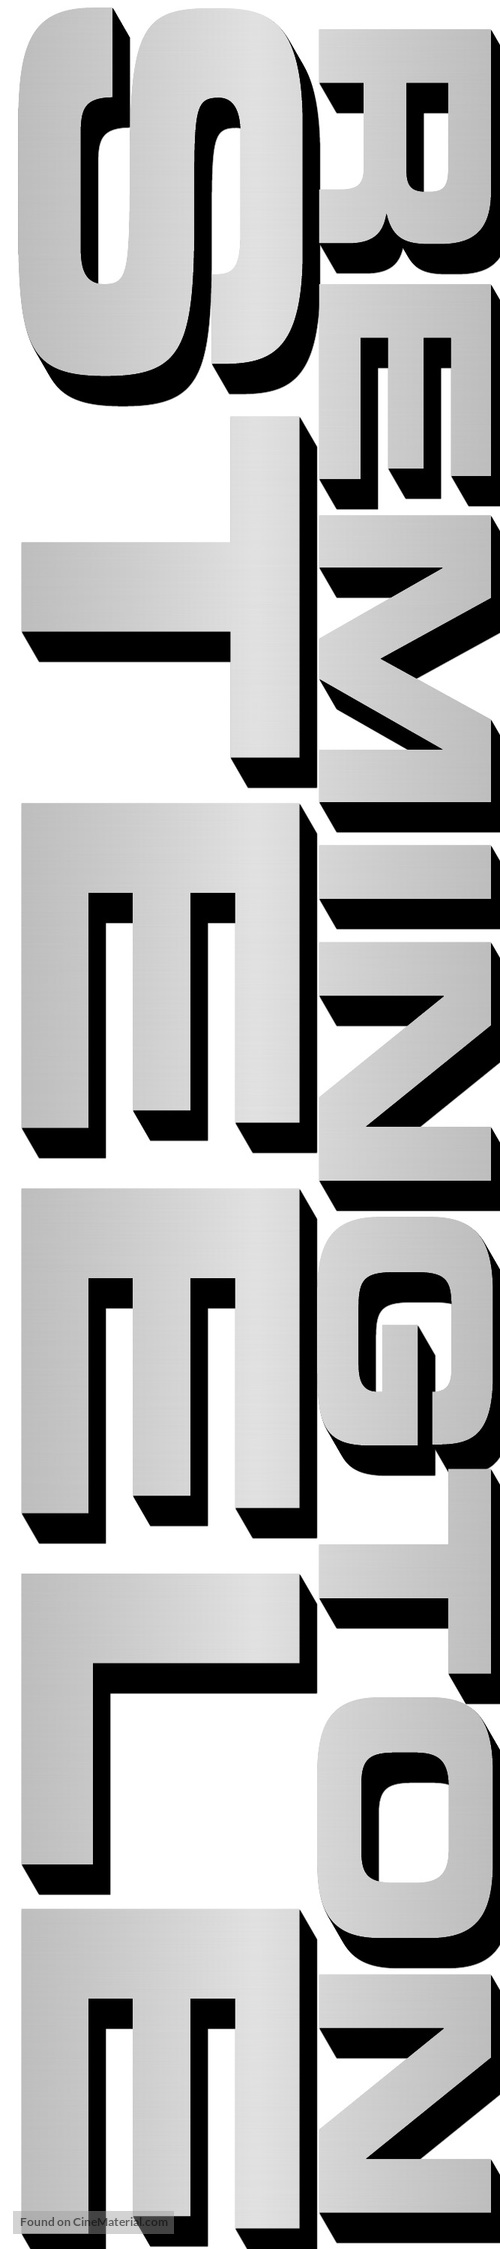 """Remington Steele"" - Logo"